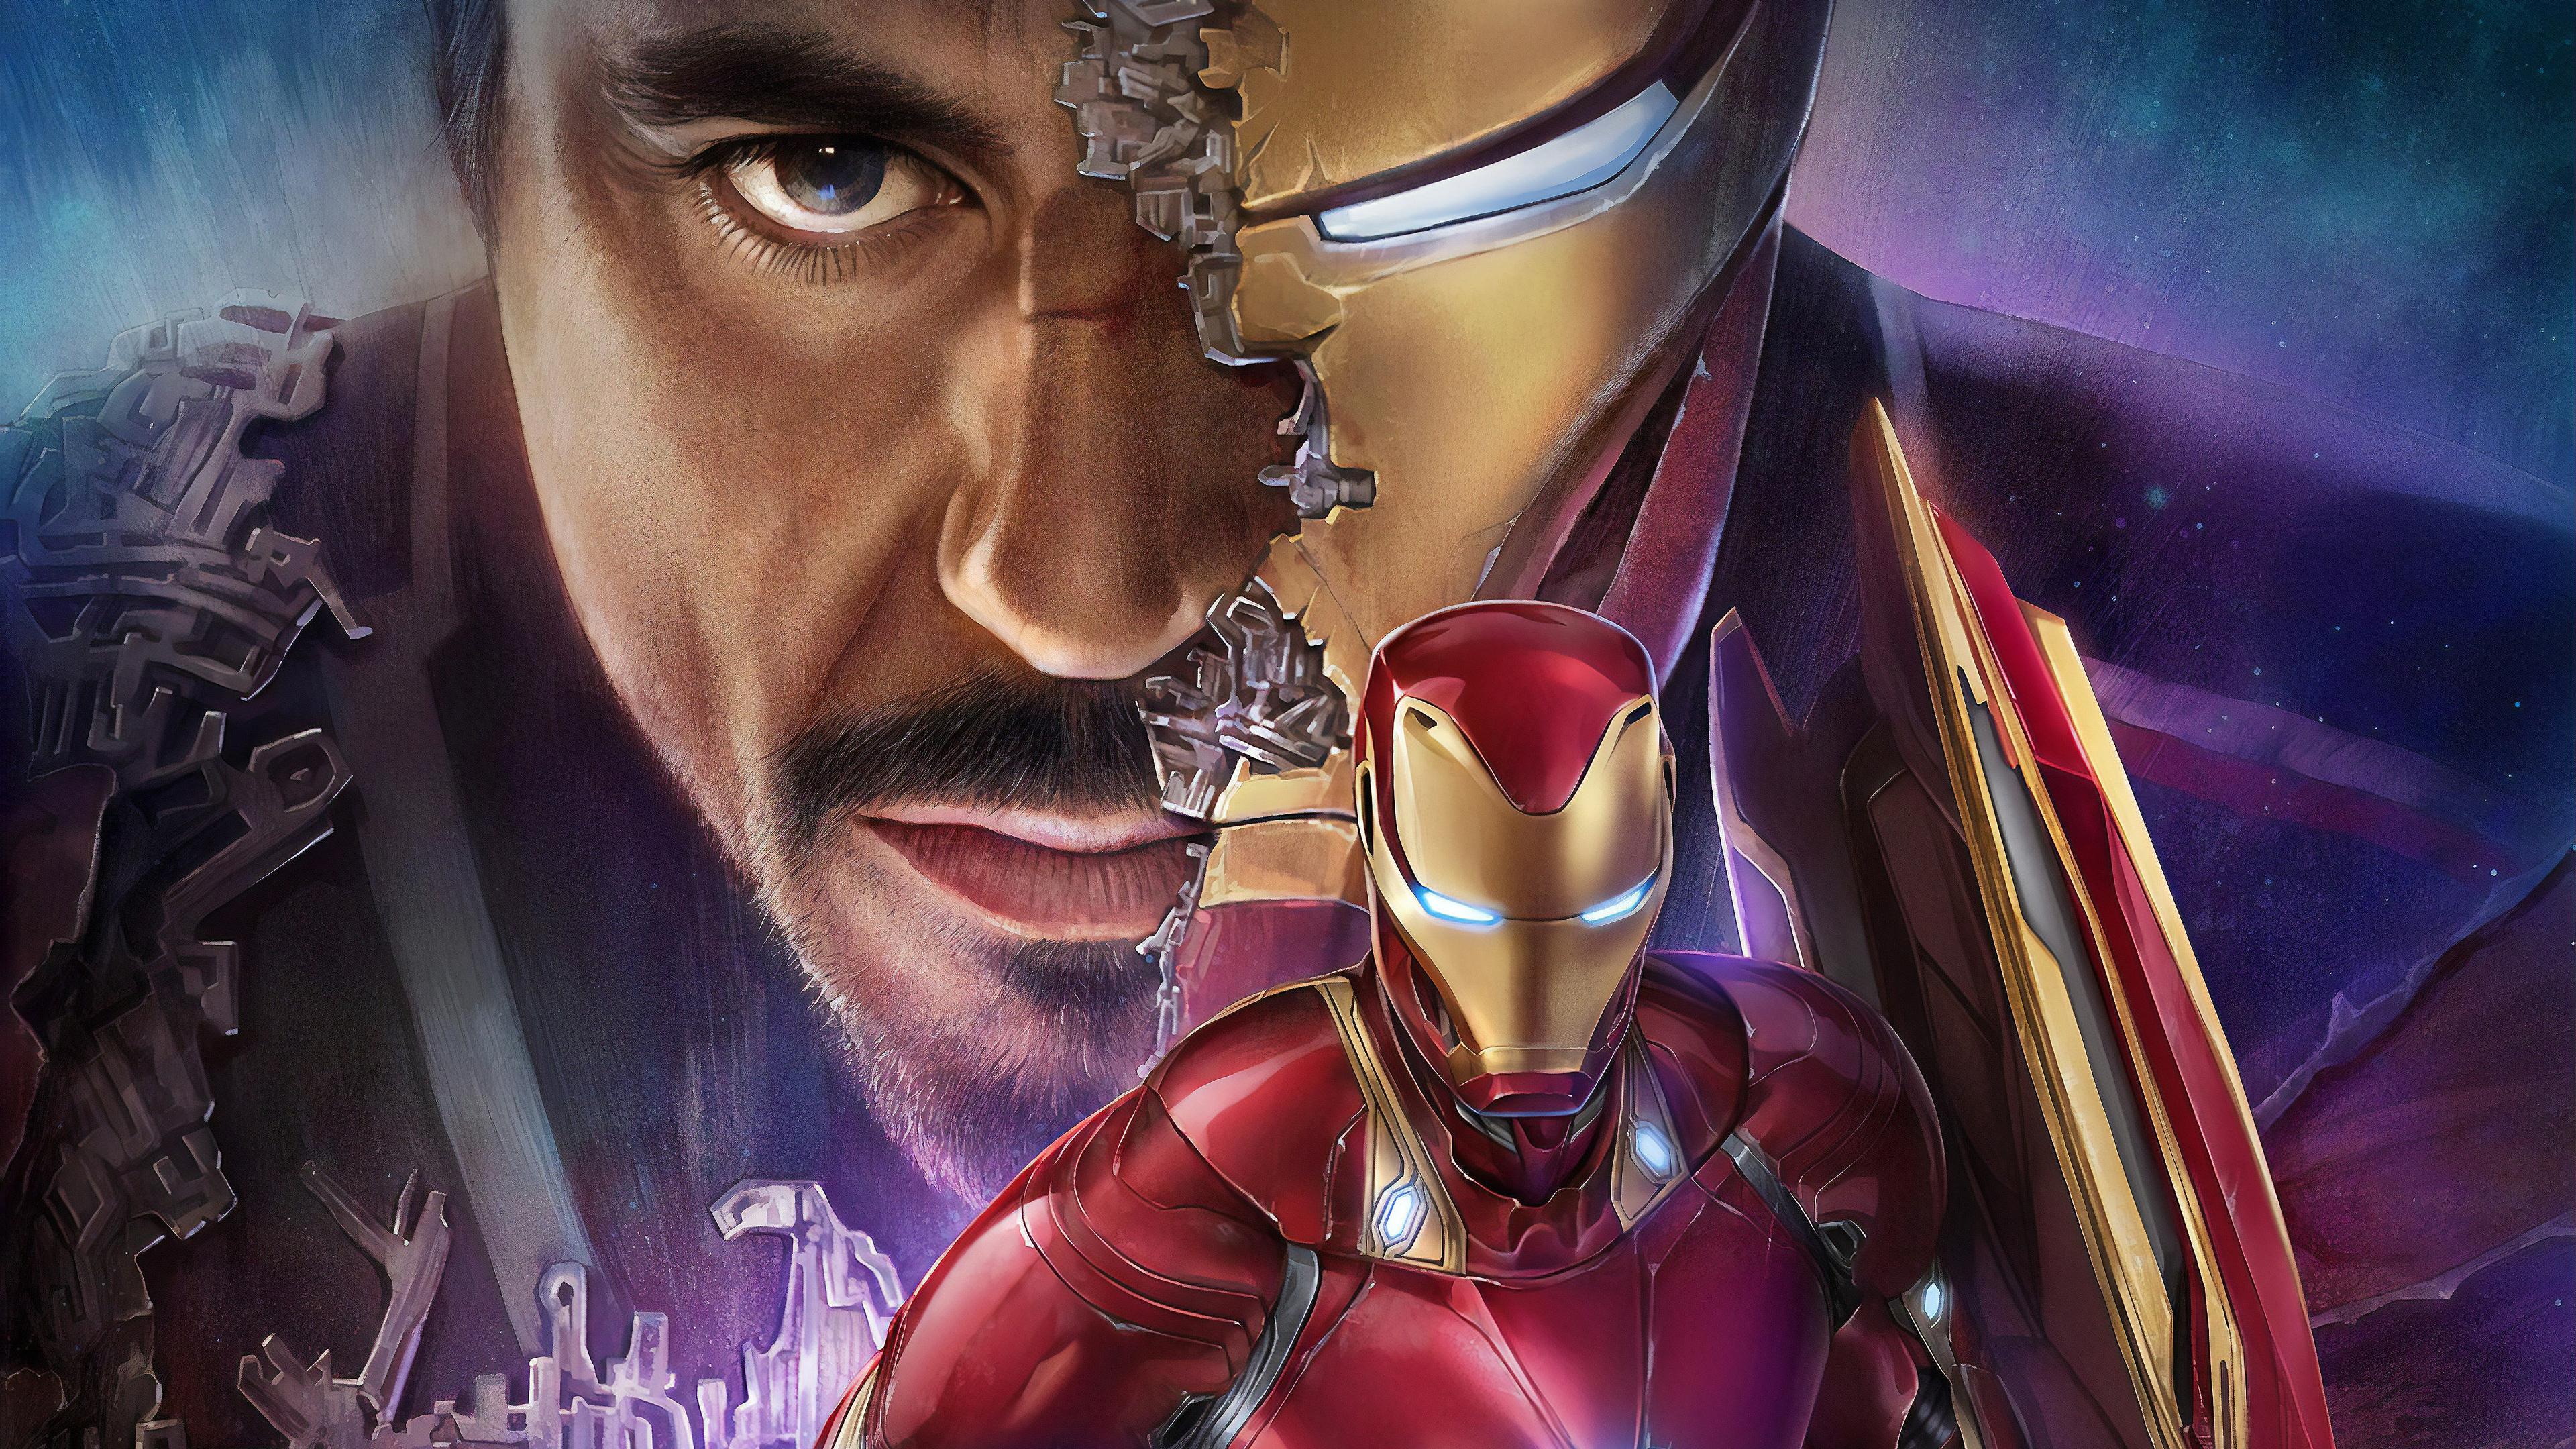 Tony Stark Iron Man 4k Hd Superheroes 4k Wallpapers